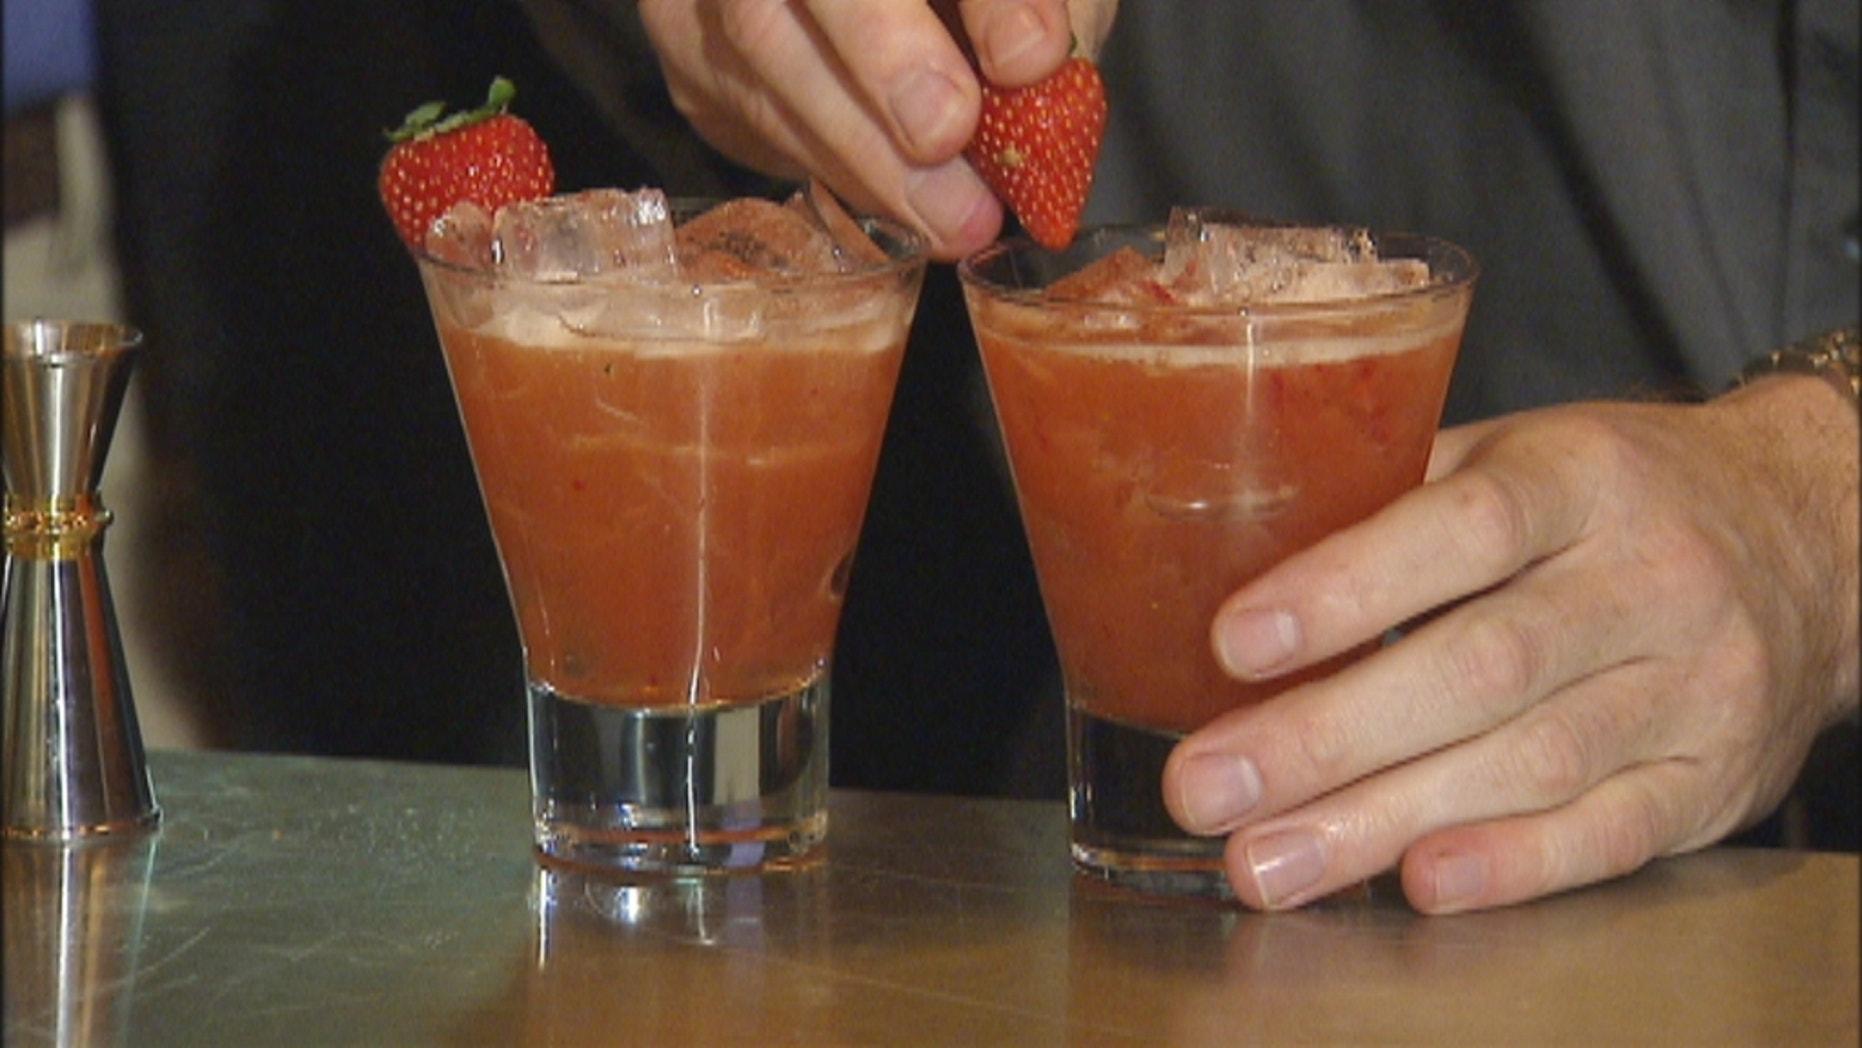 The Dandy: 2 oz Wild Turkey bourbon, ¾ oz cinnamon honey, ½ oz fresh lemon, ¼ oz Antica vermouth, 1 muddled strawberry, Palo mamajuana (optional). Shake served in a high ball glass. Garnish with Strawberry.